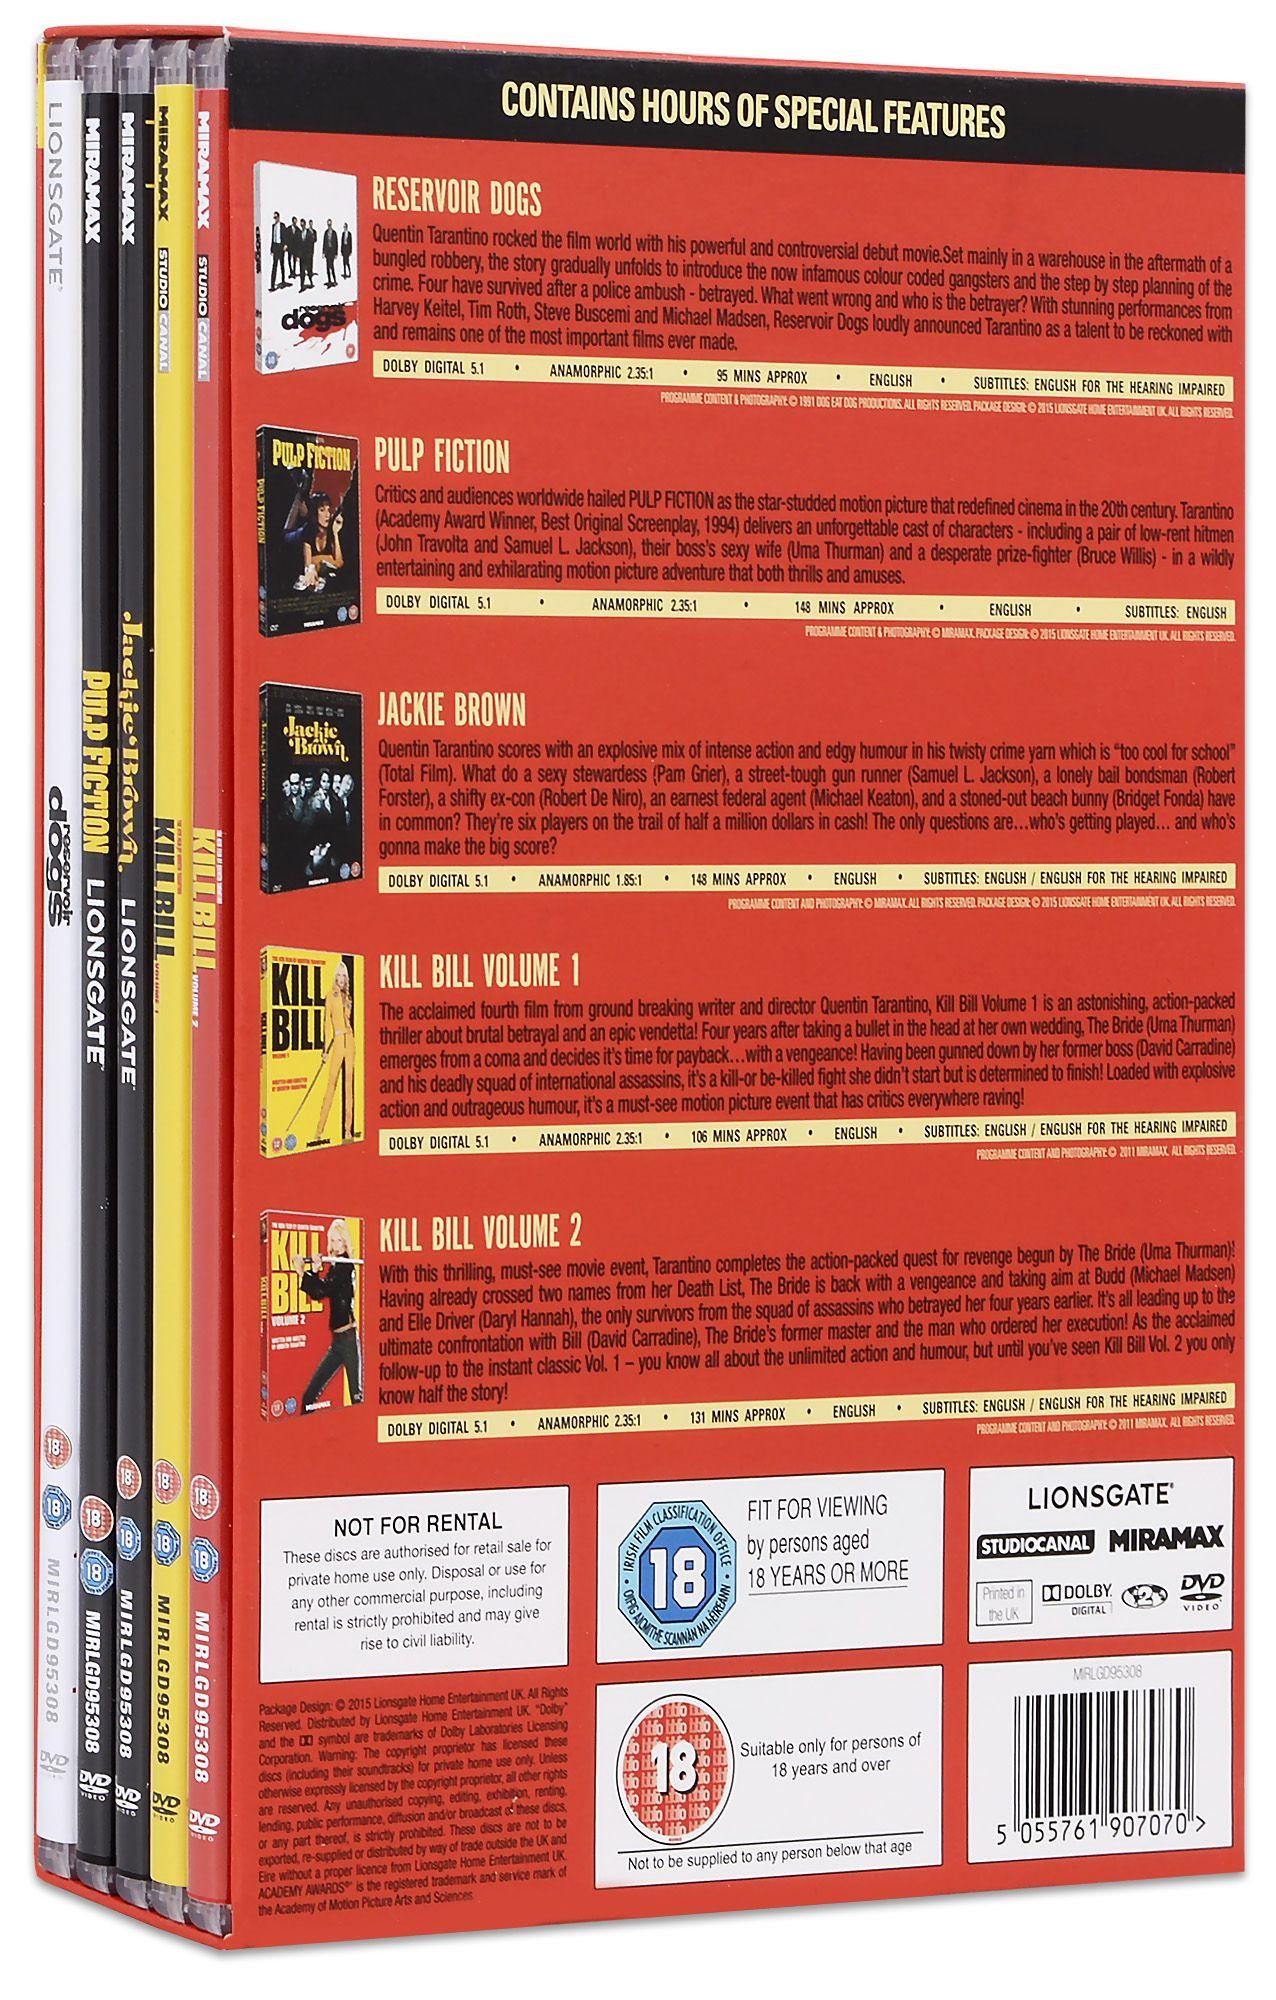 The Quentin Tarantino Collection (DVD) - 3